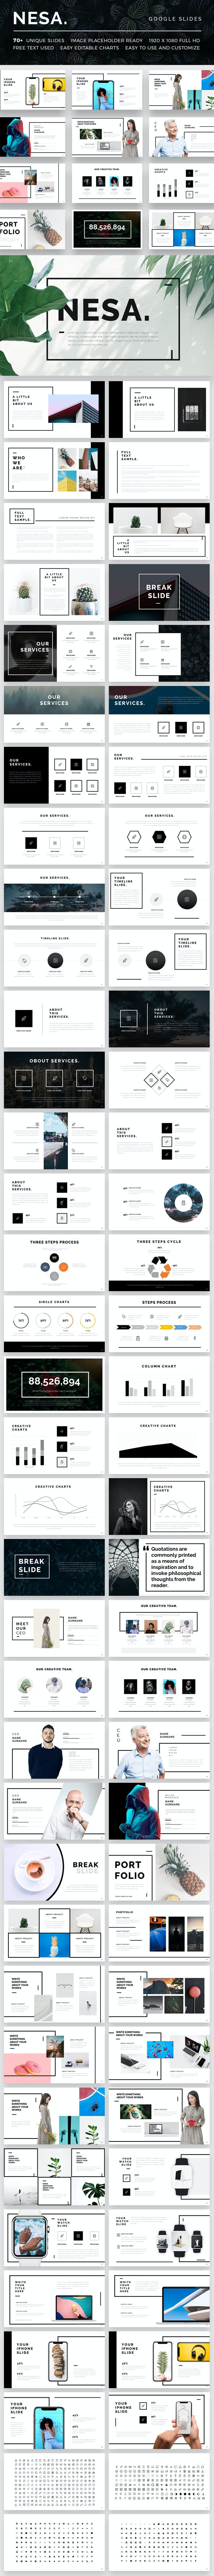 Nesa Google Slide Template - Google Slides Presentation Templates